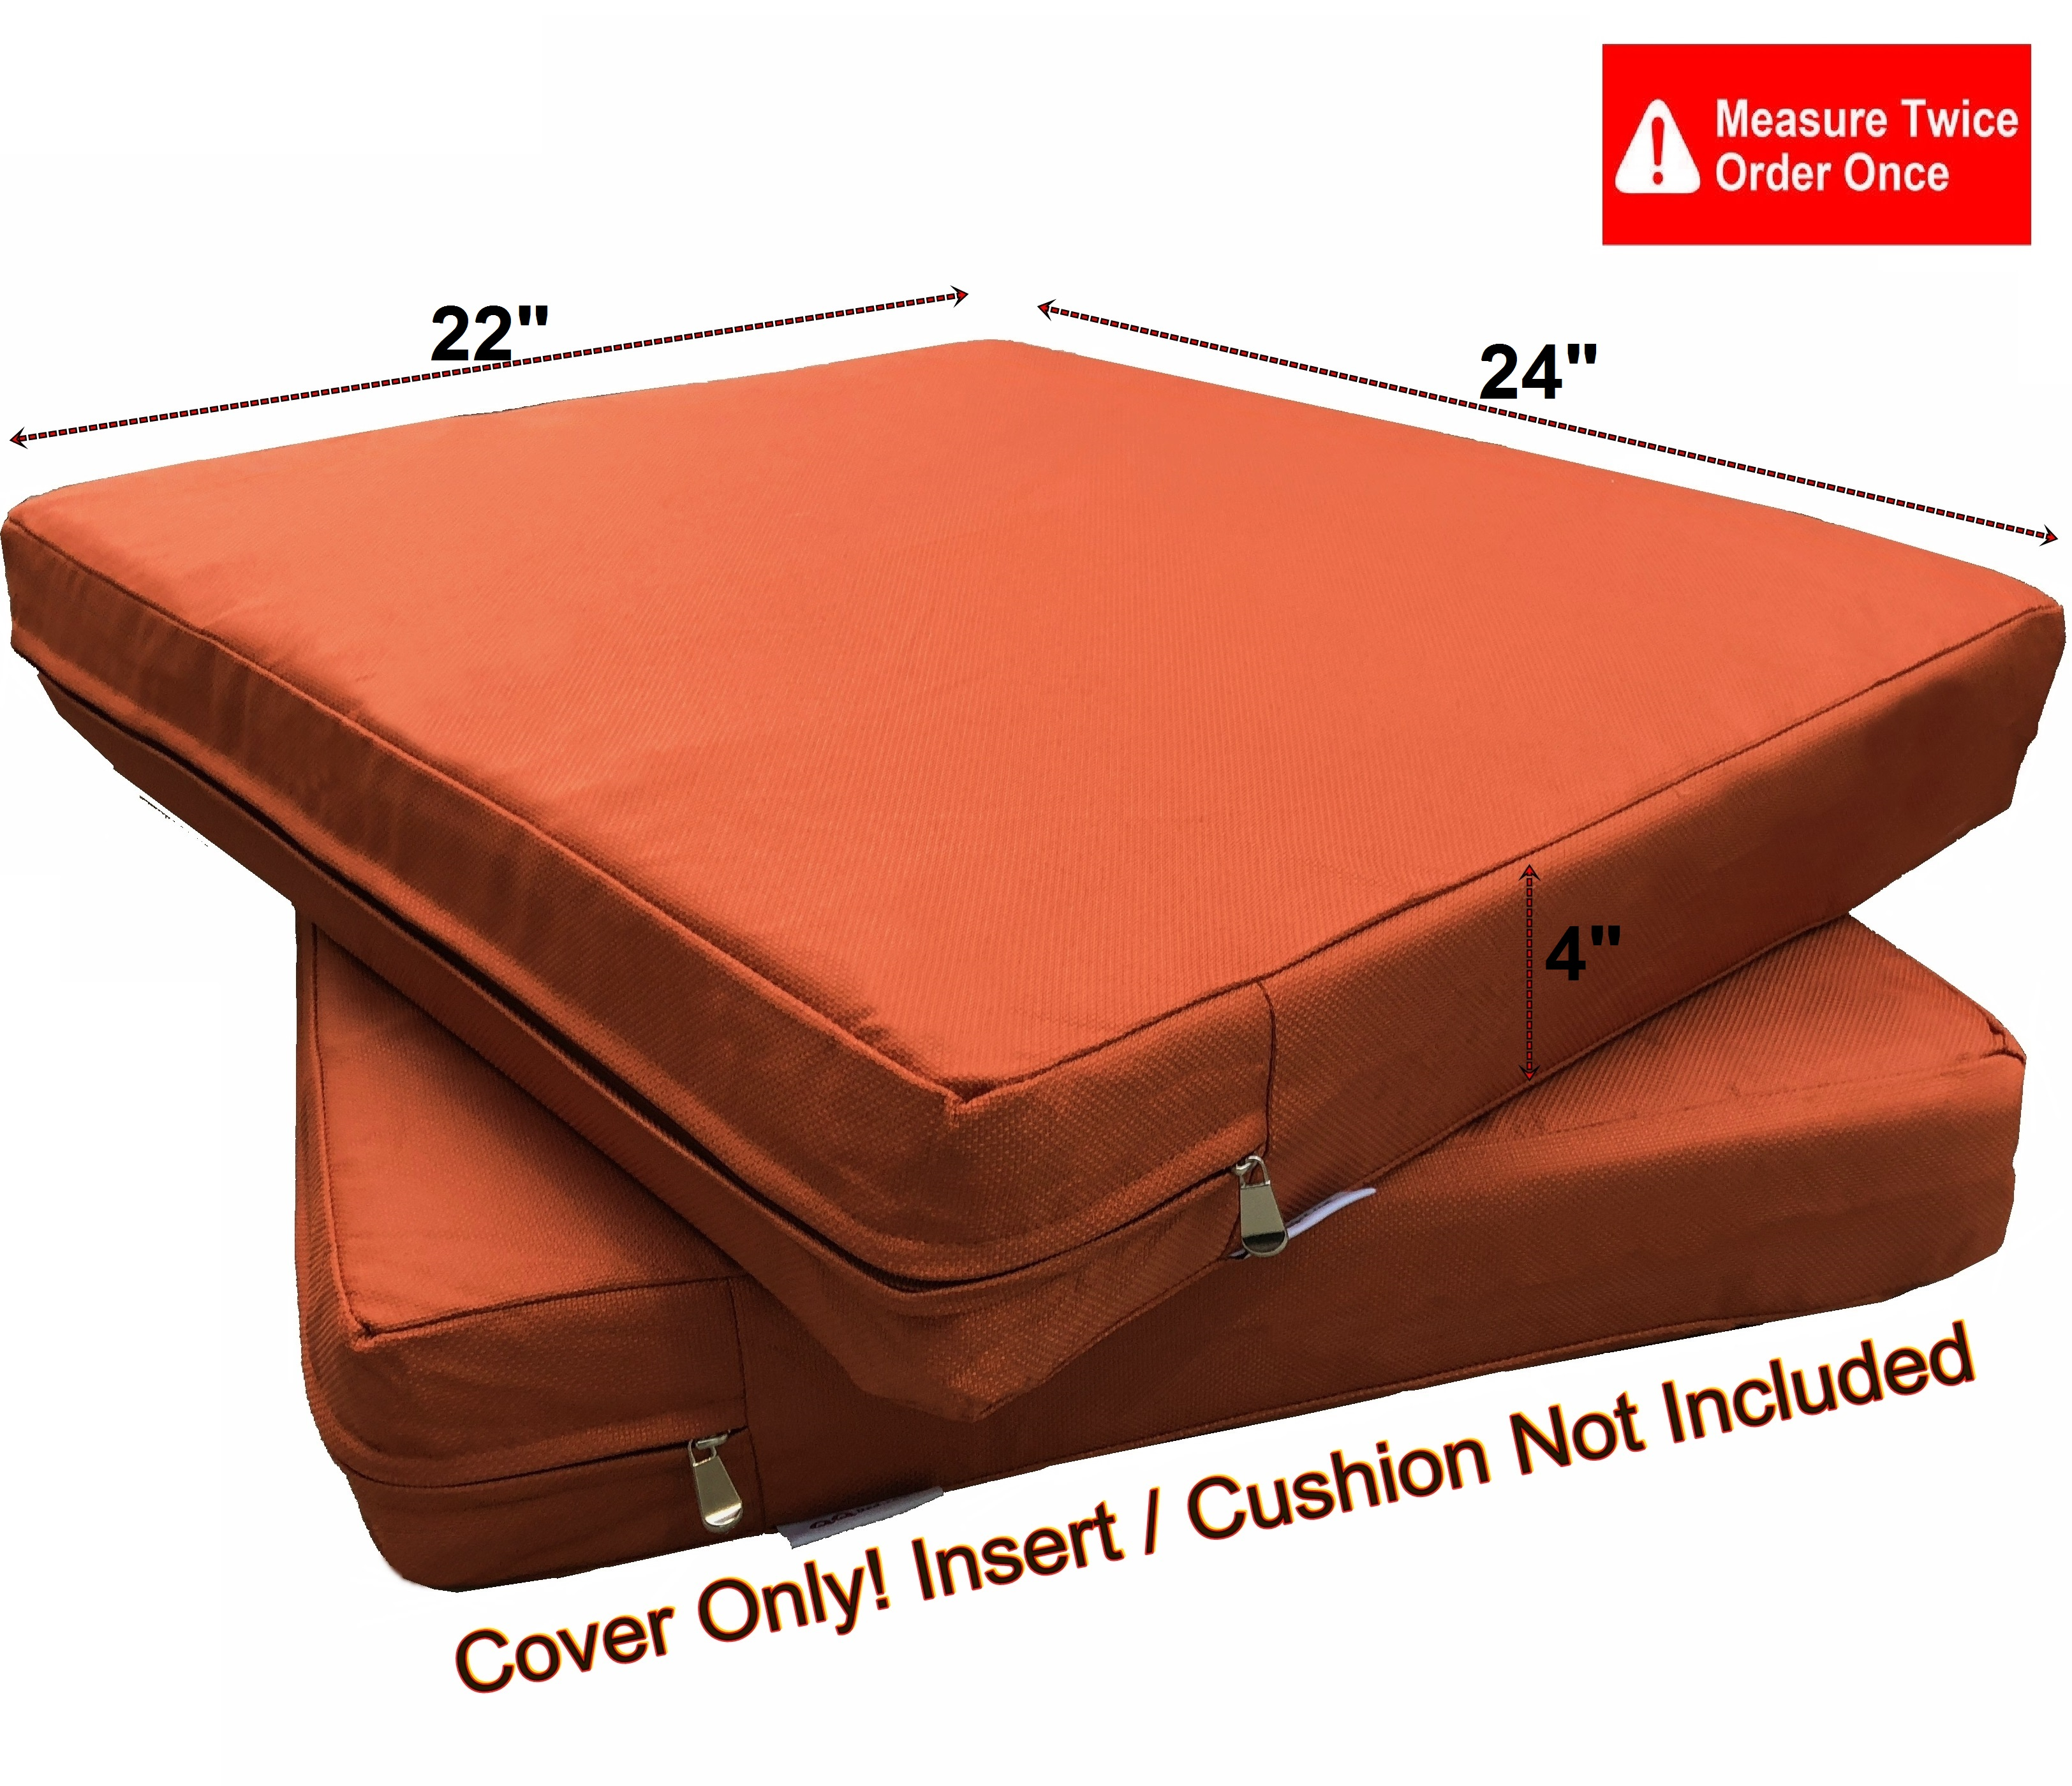 waterproof outdoor 4 pack deep seat chair patio cushions zipper cover 24 x22 x4 duvet replacement case walmart com